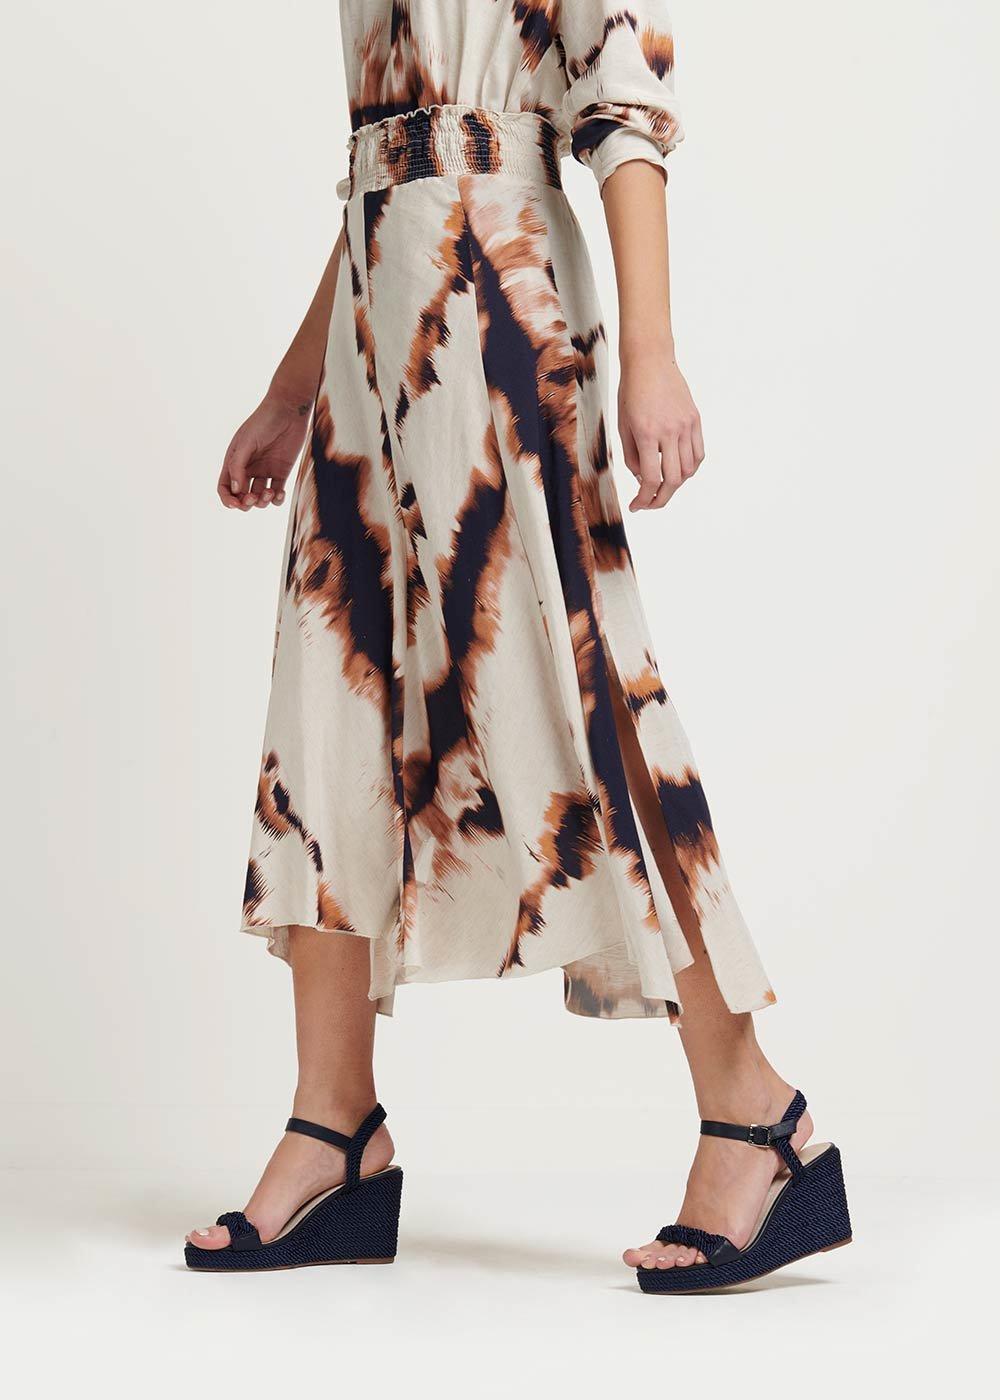 Genny matching long skirt - L.beige\ Coccio Fantasia - Woman